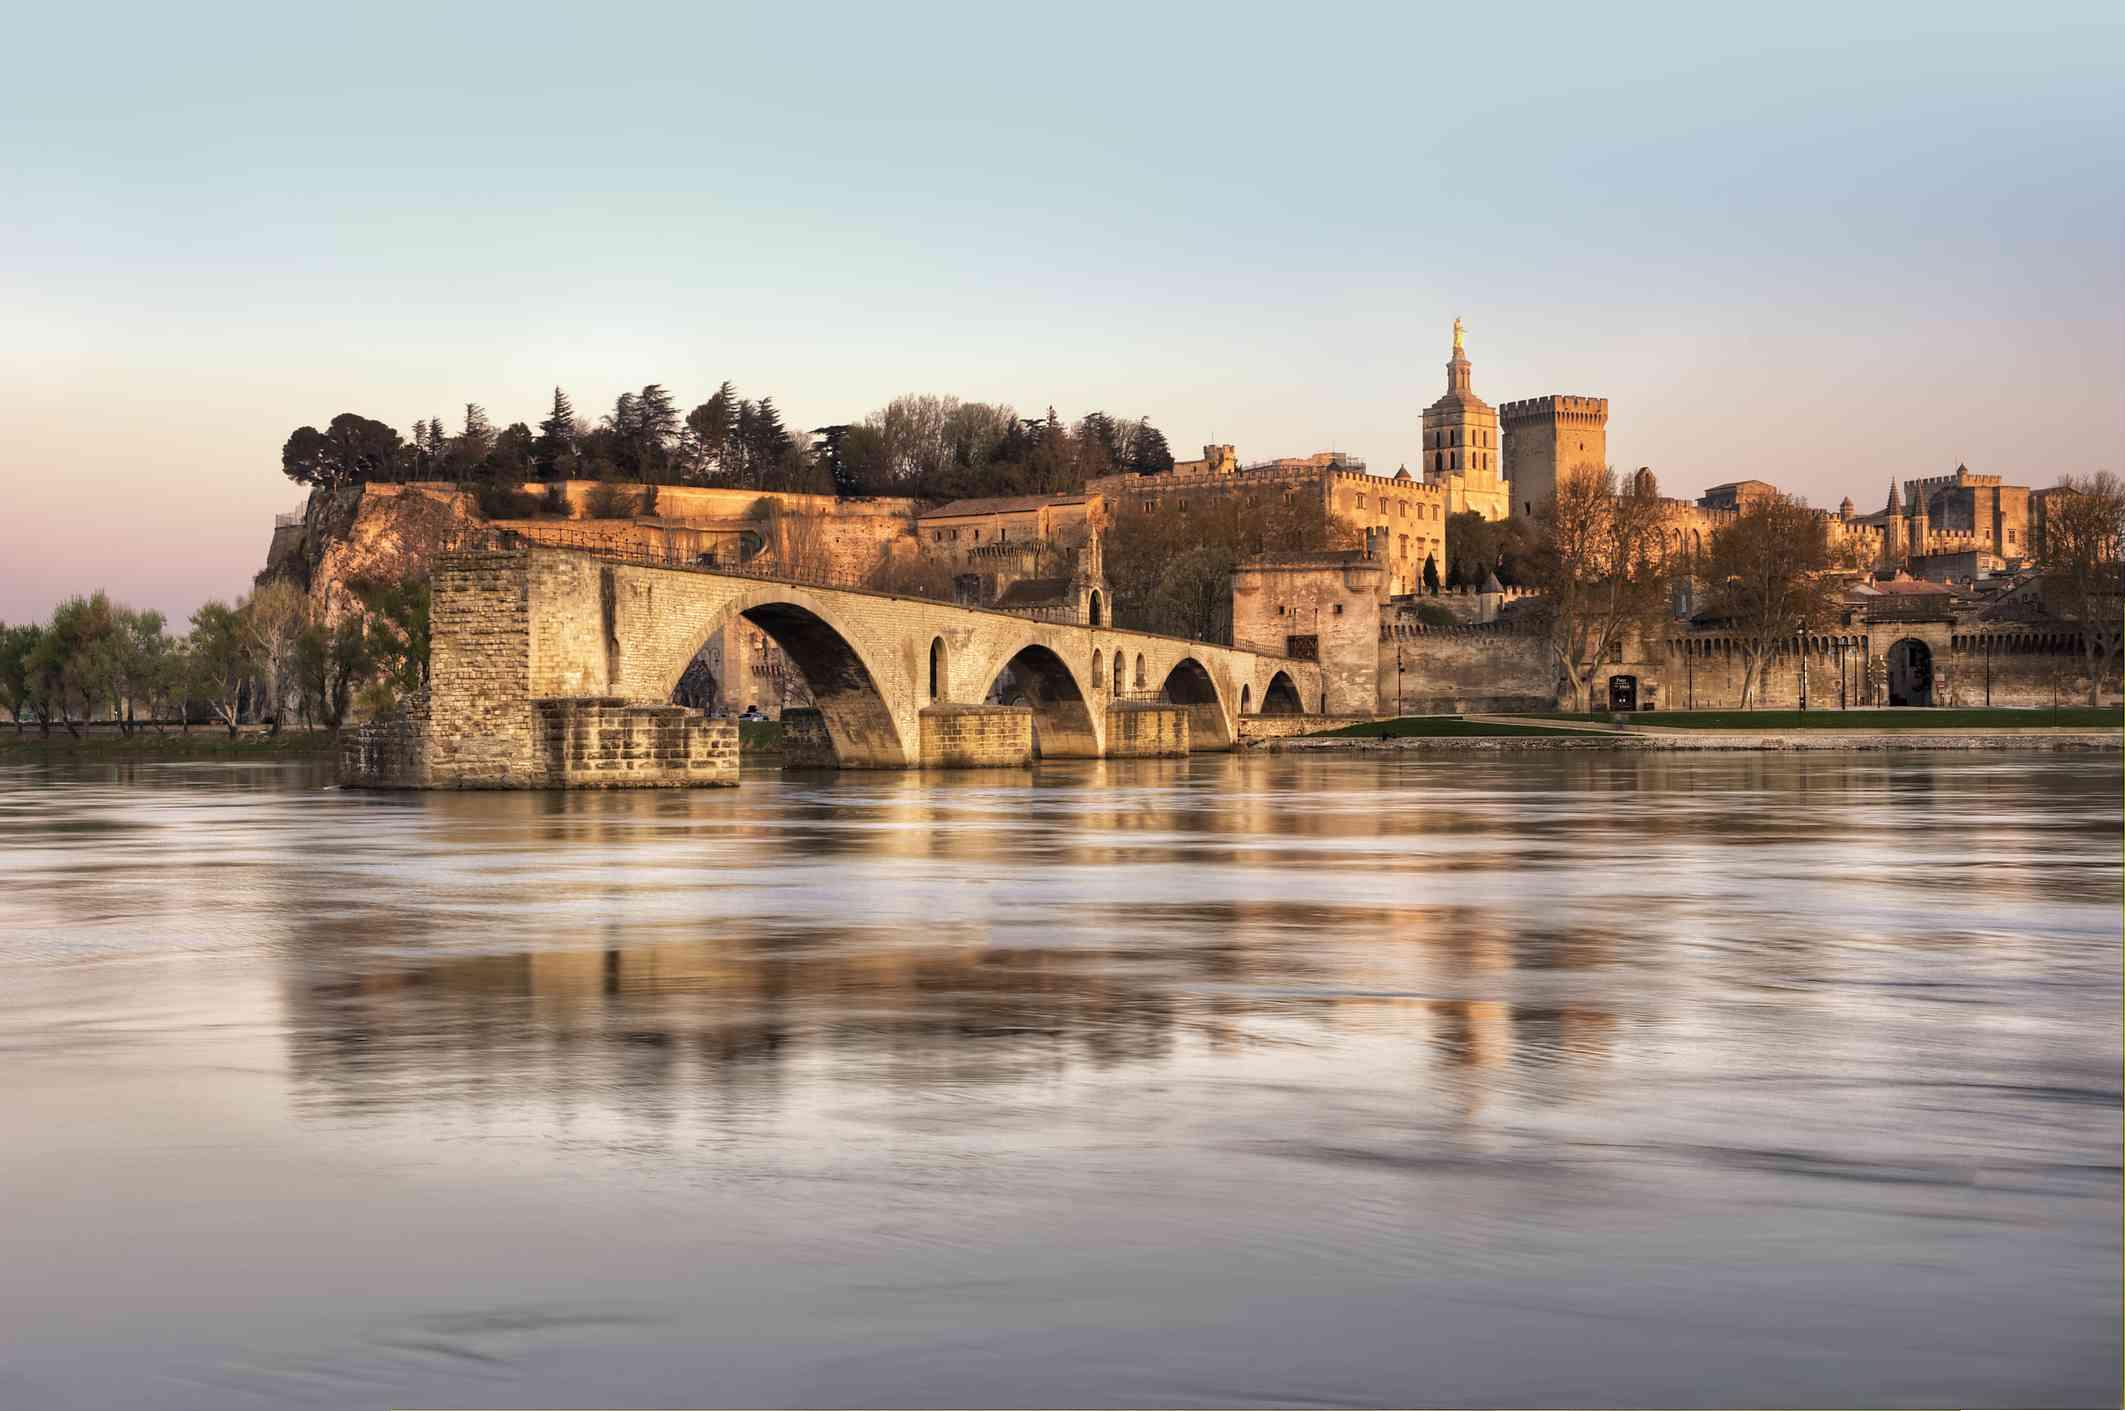 City of Avignon